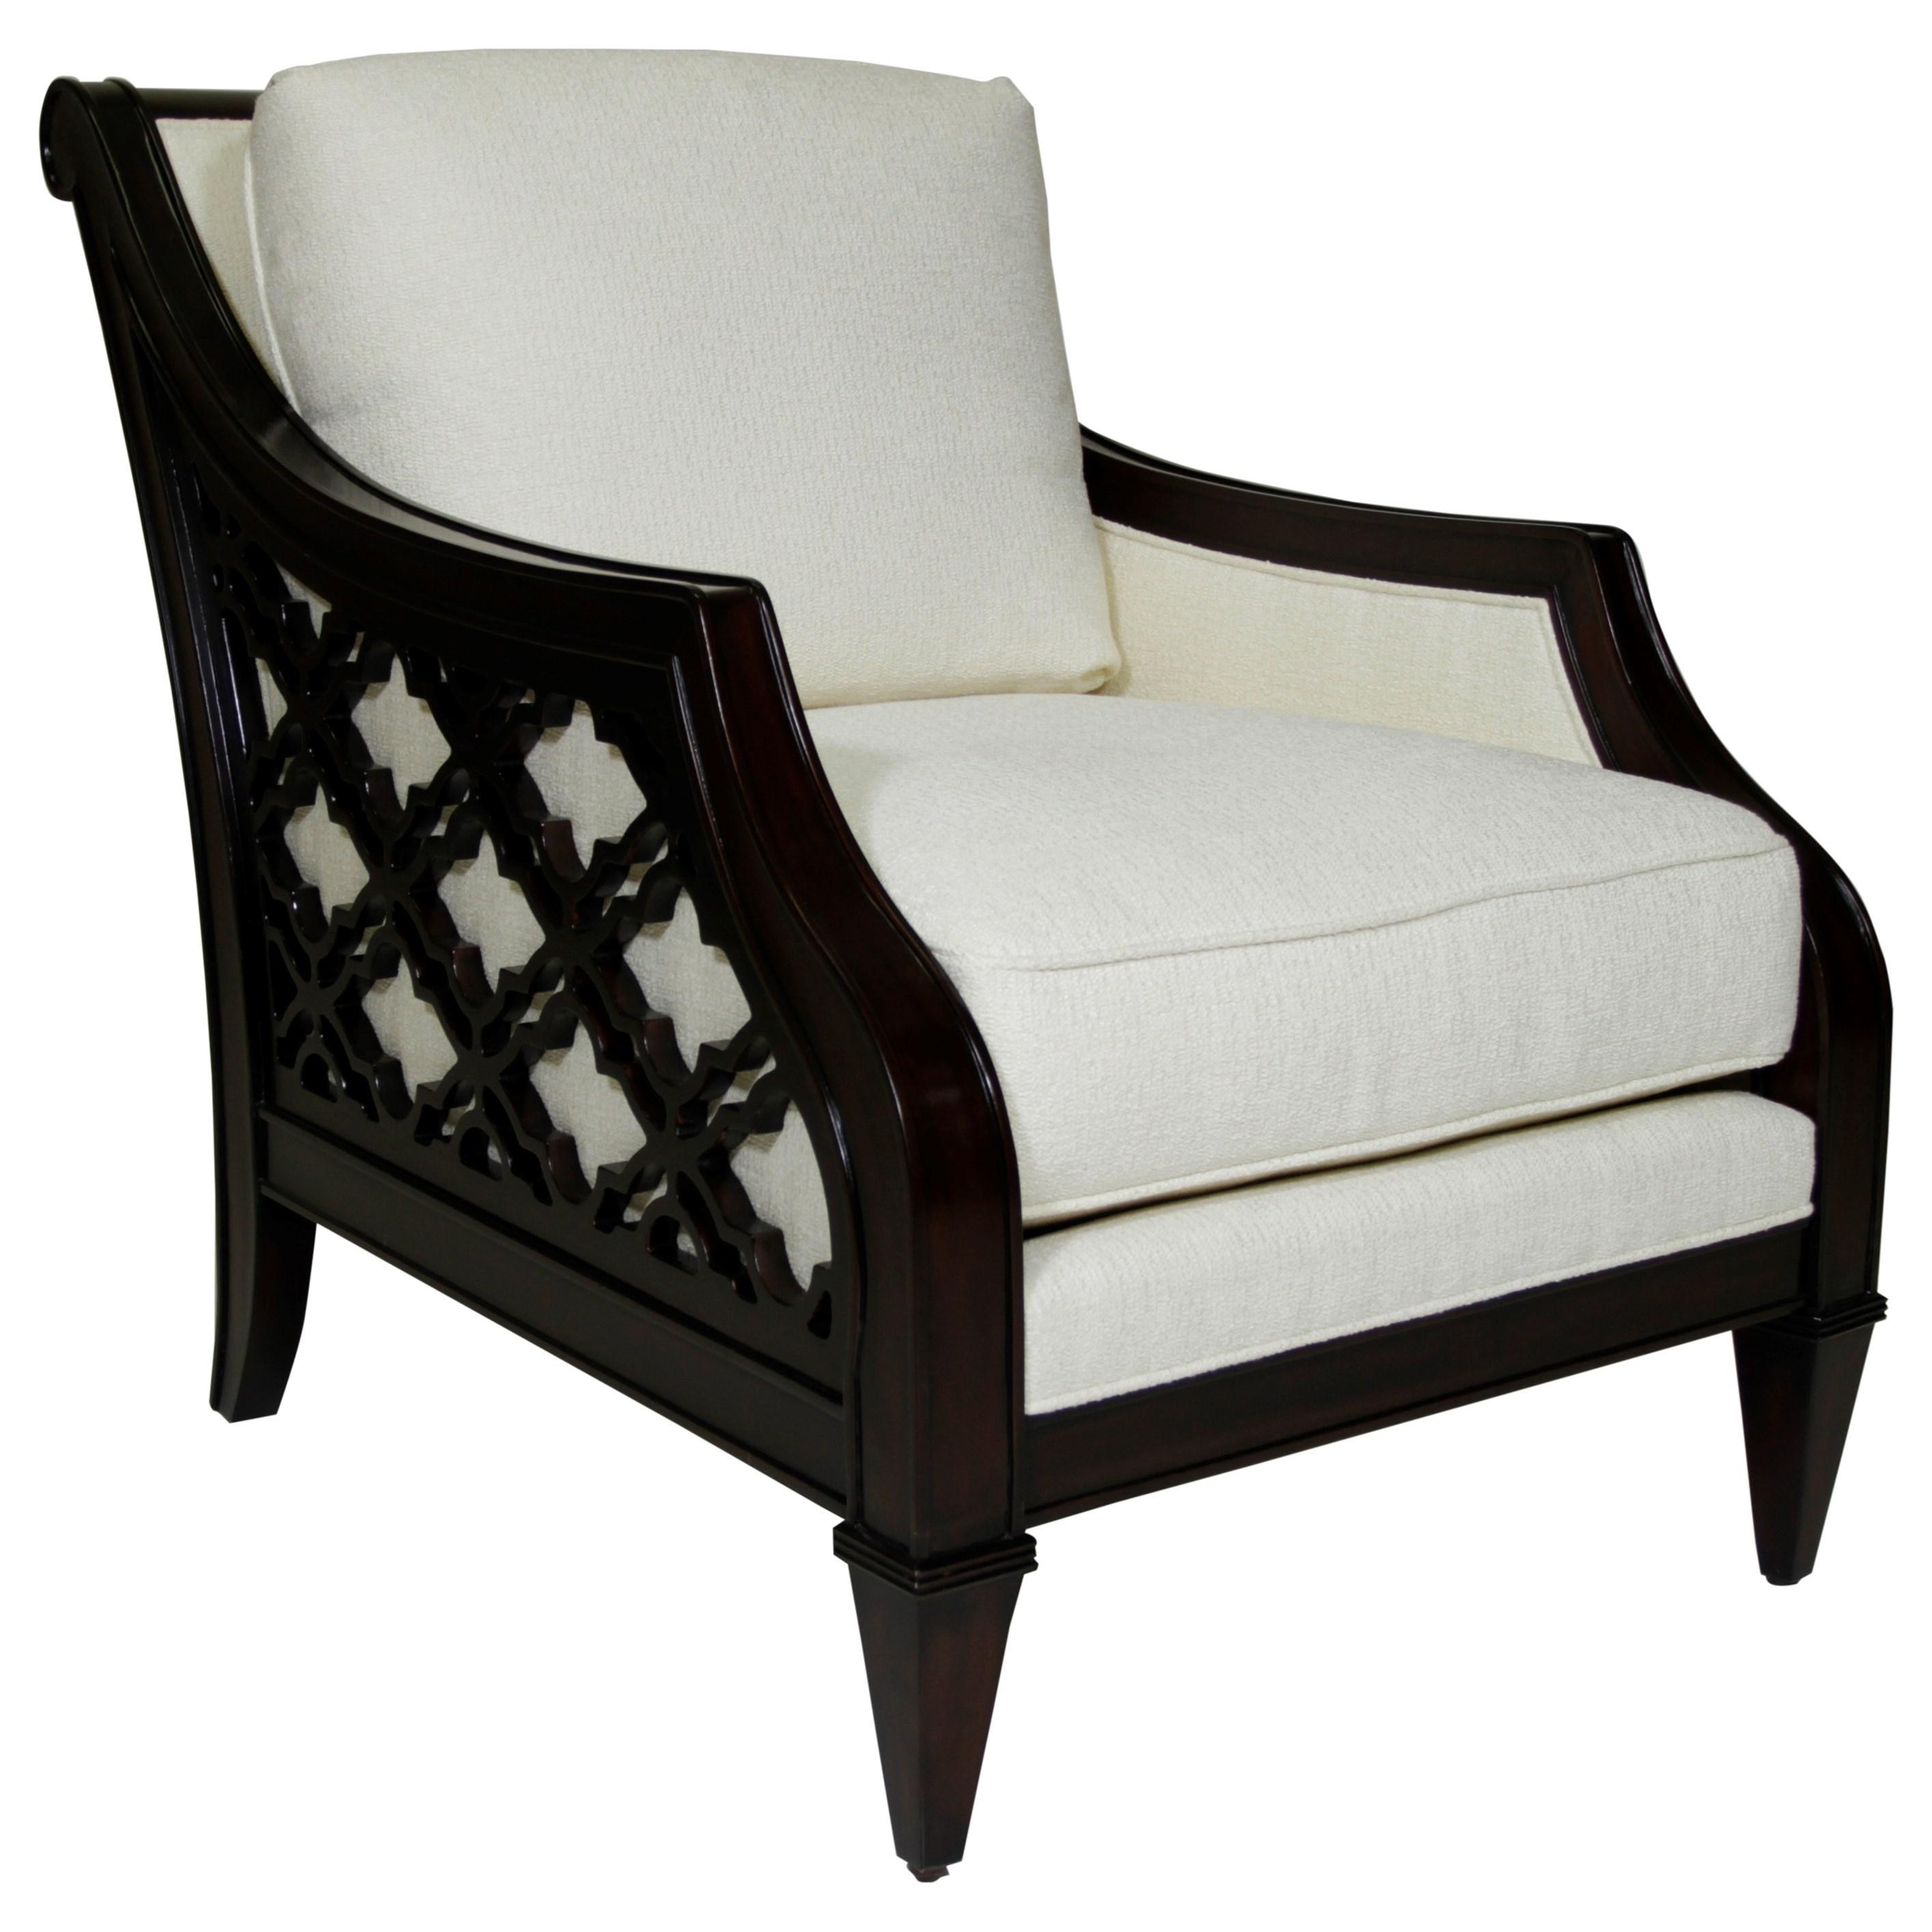 Tommy Bahama Home Royal Kahala Bay Club Chair With Quatrefoil Design Sides